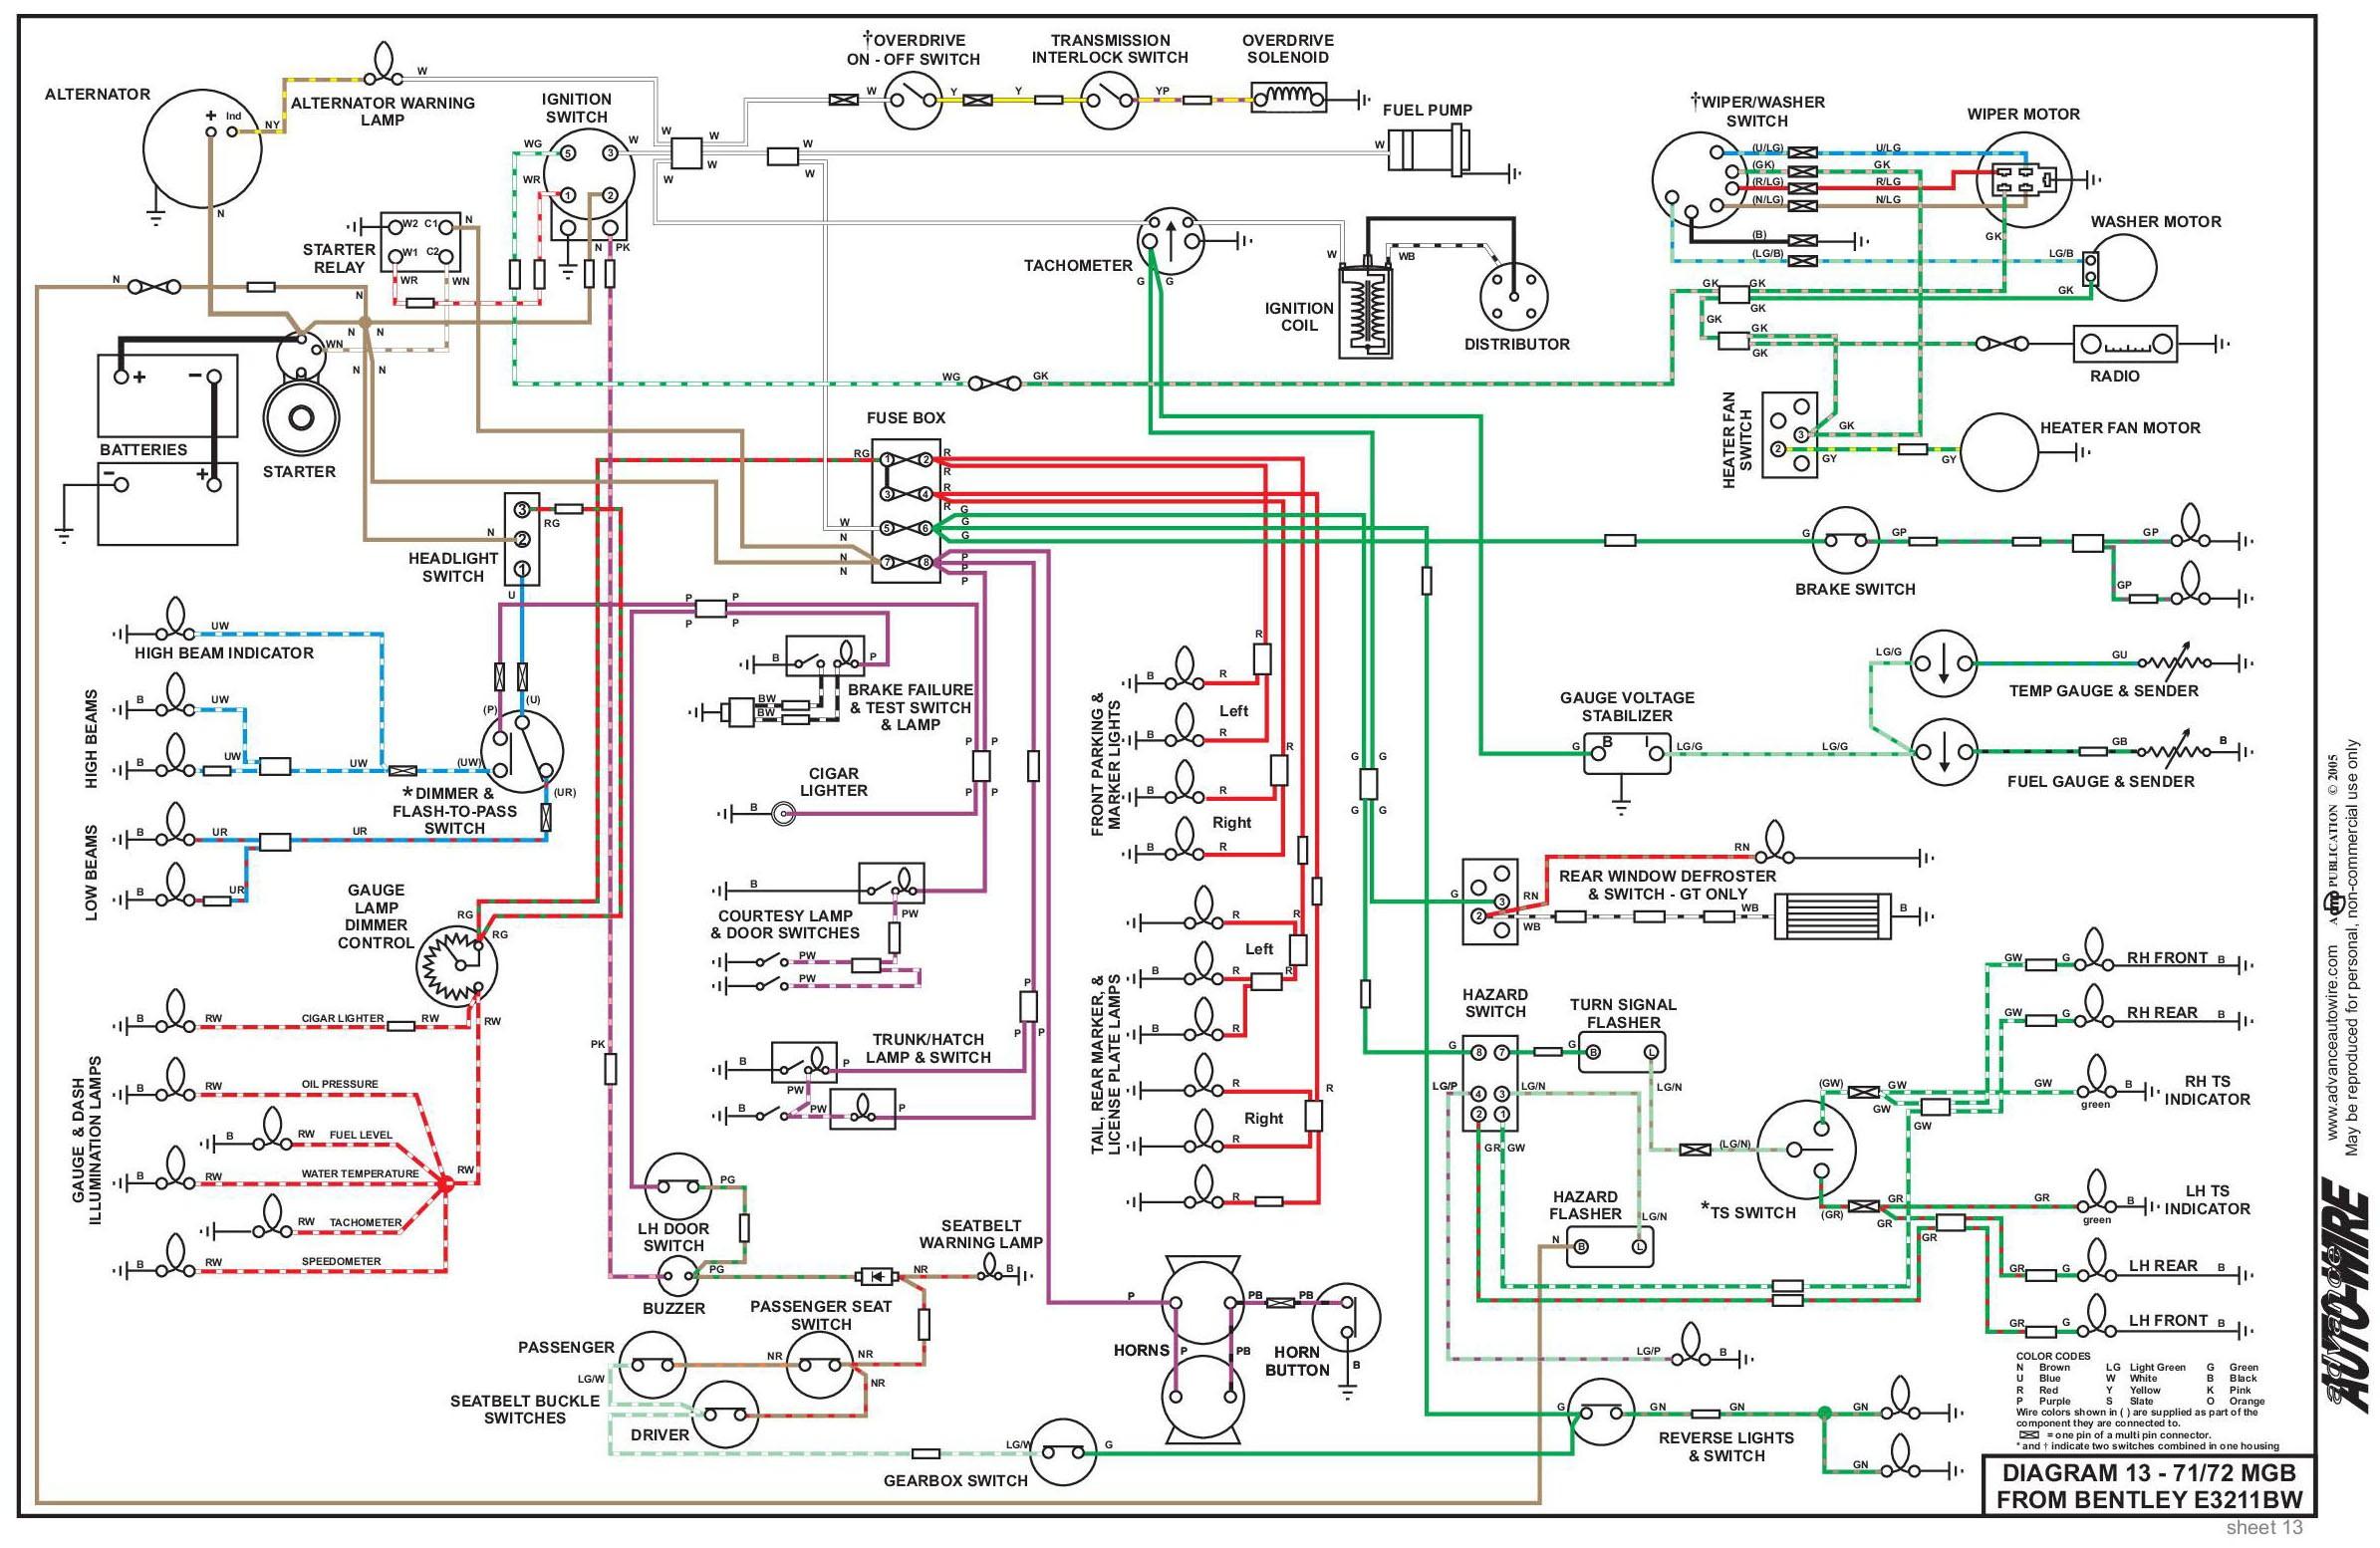 Led Turn Signal Flasher Relay Wiring Electrical System Of Led Turn Signal Flasher Relay Wiring